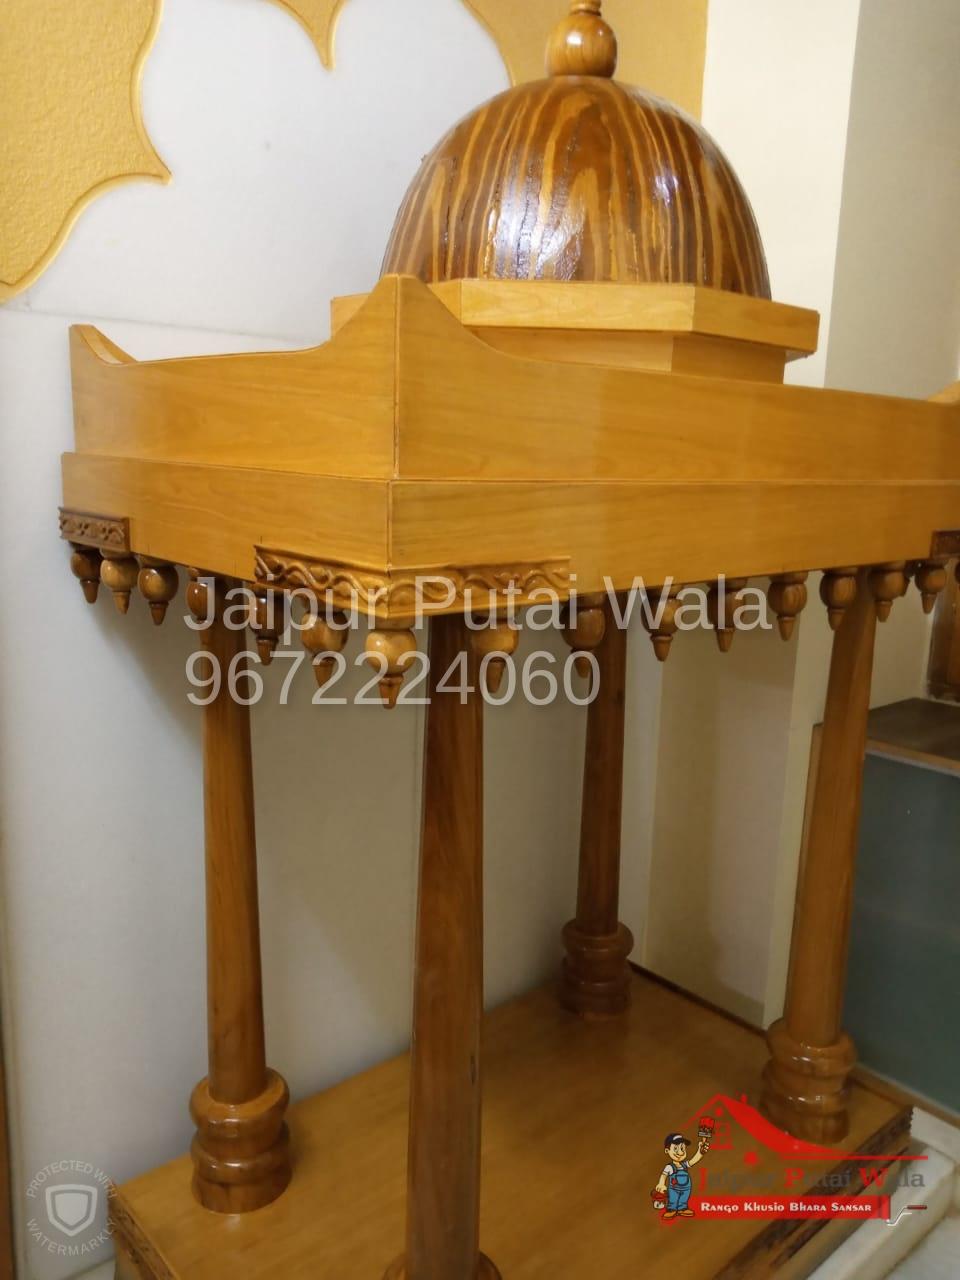 melamine-glossy-veneer-jaipur-wood-polish-7.jpeg